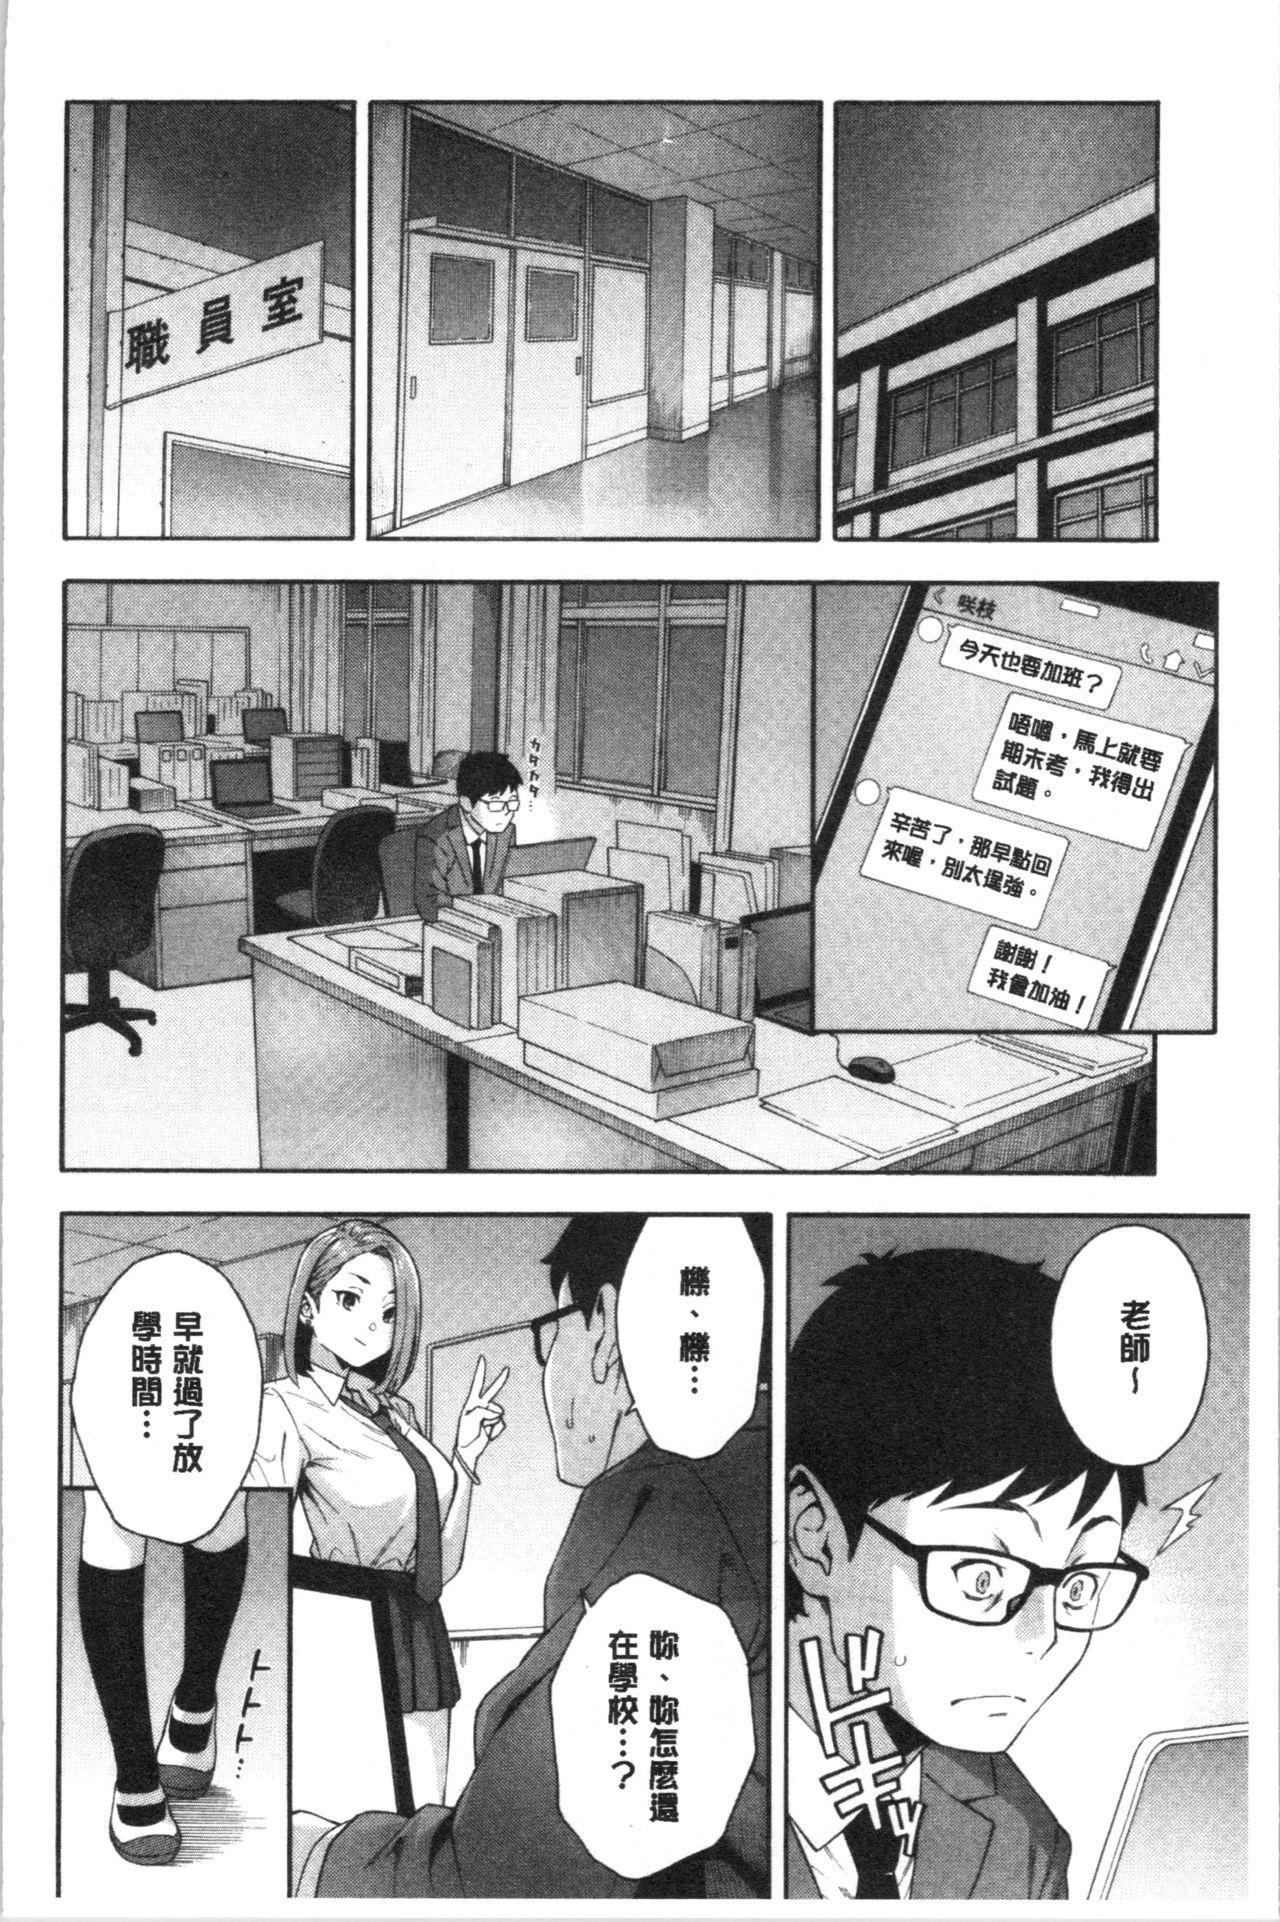 Okashite Ageru | 讓你來侵犯我 10